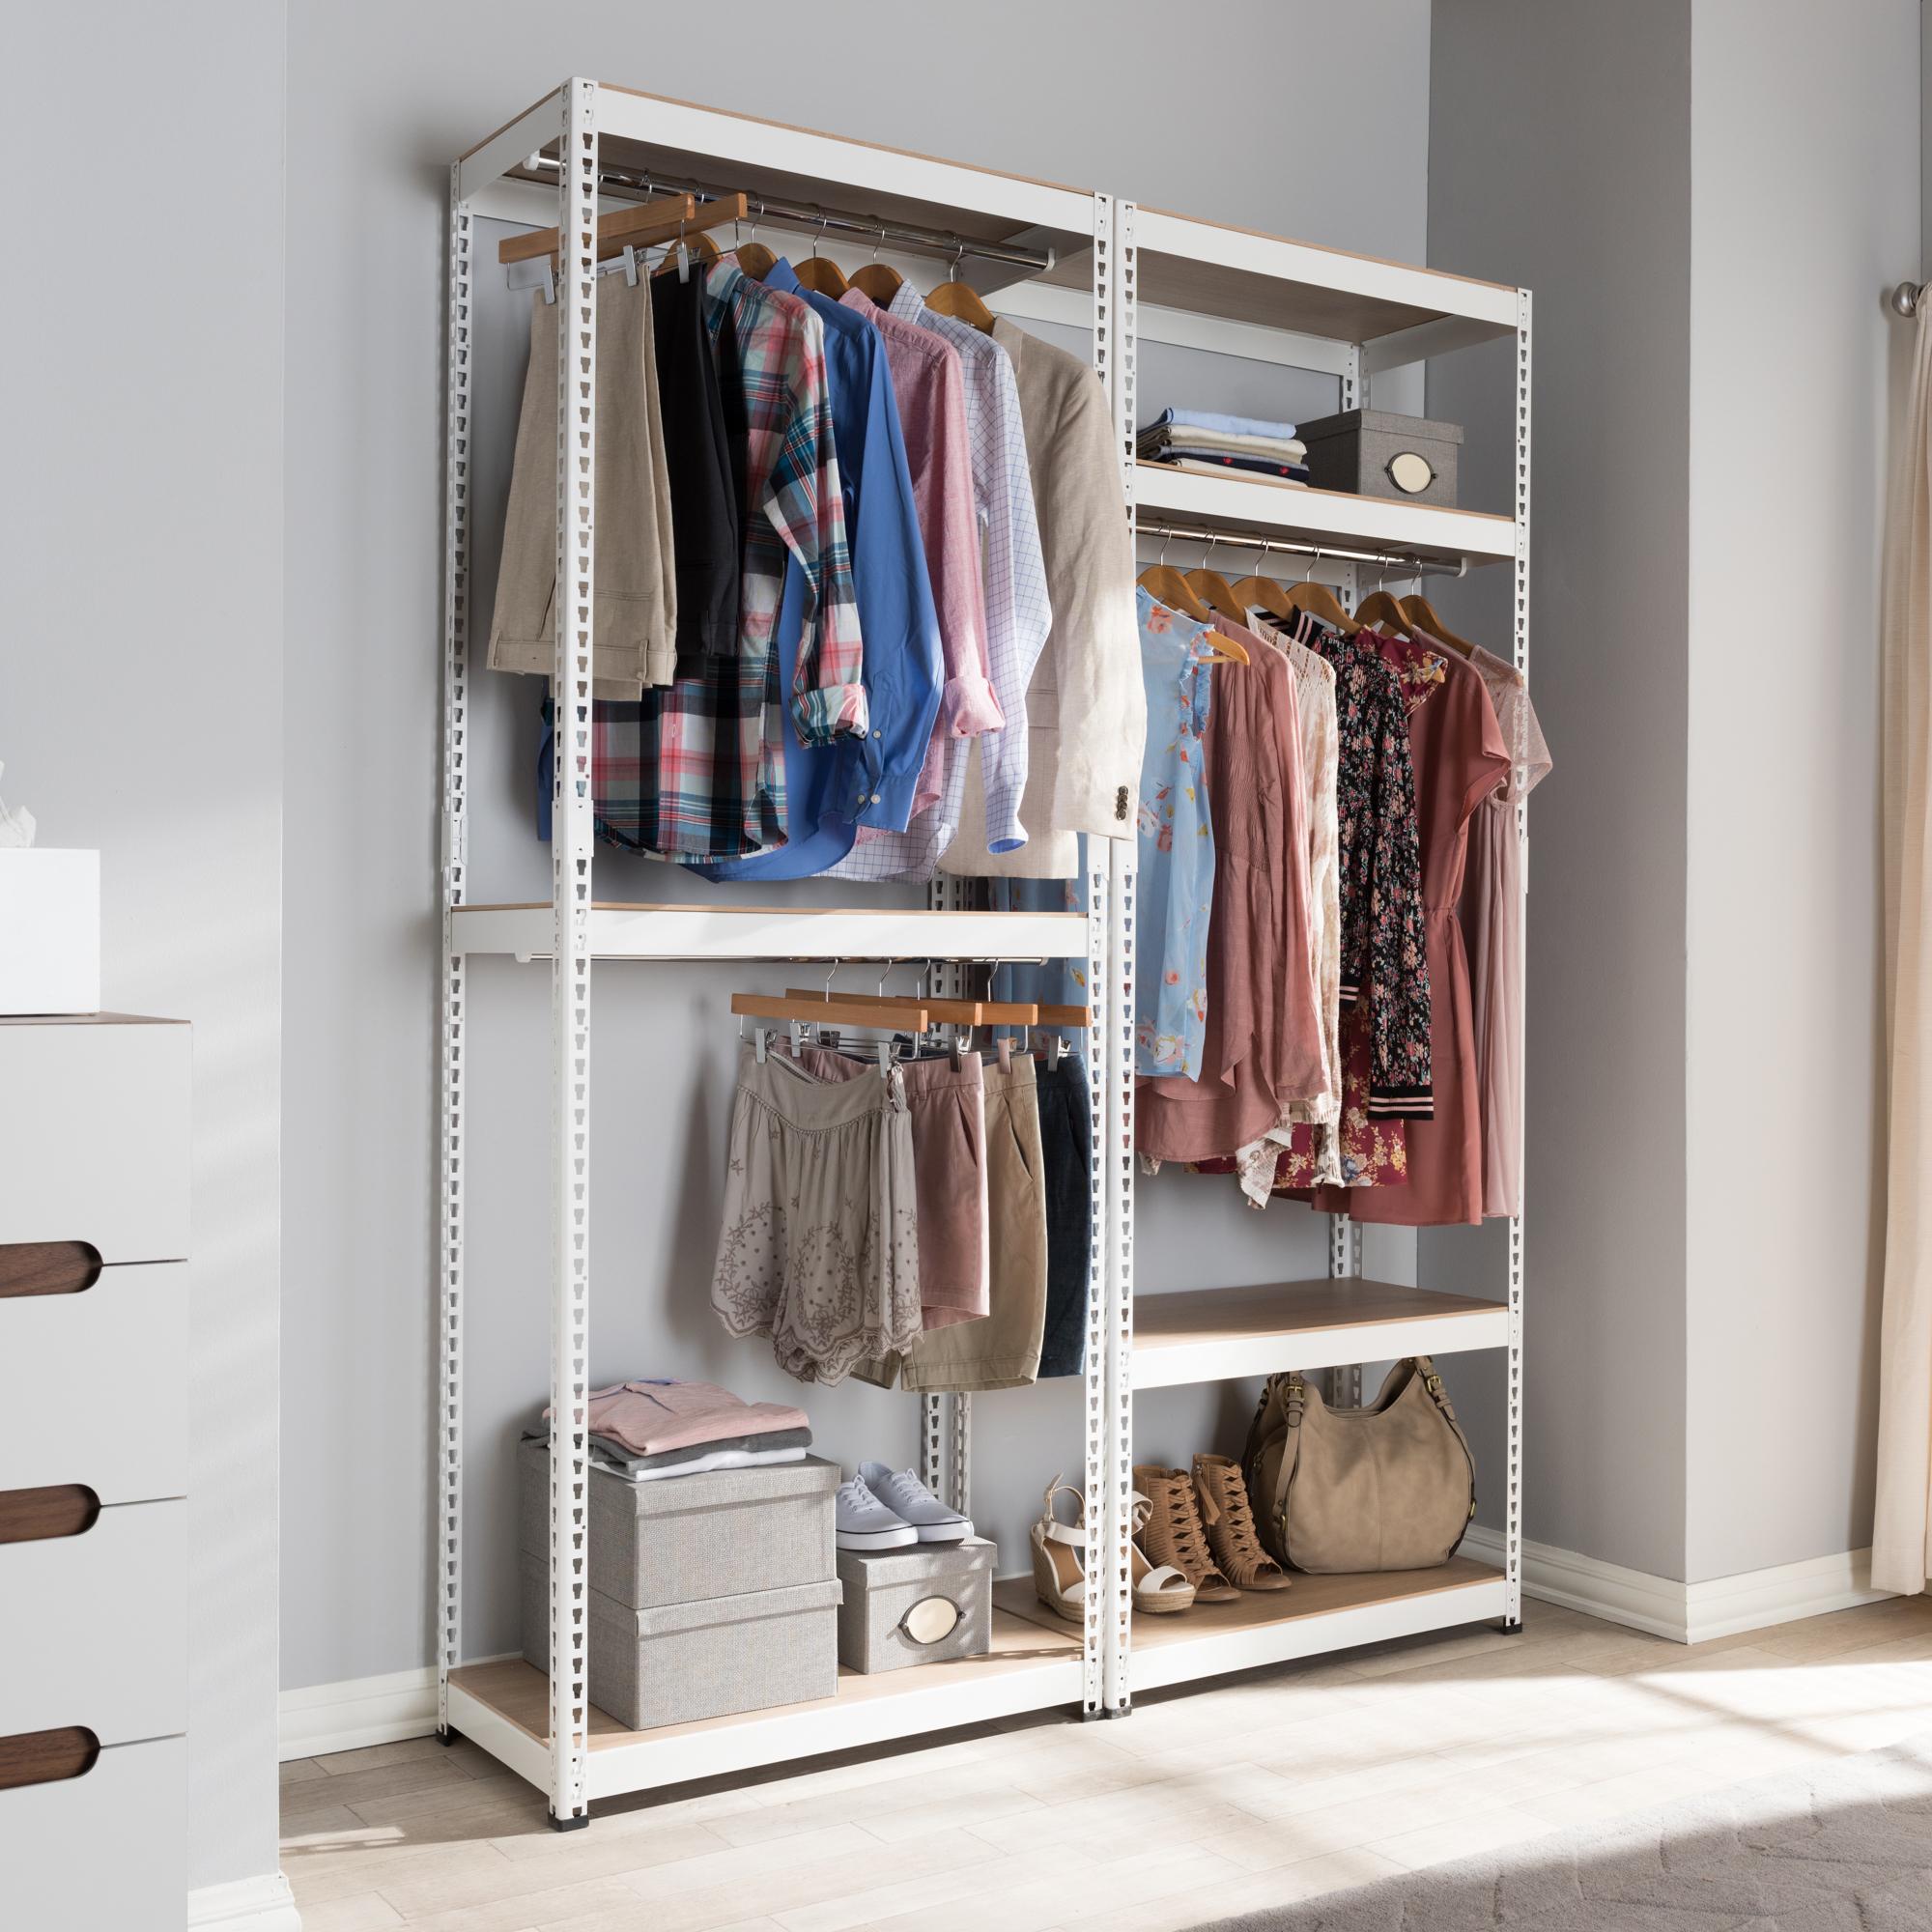 Wonderful ... Baxton Studio Gavin White Metal 7 Shelf Closet Storage Racking  Organizer   IEWH06/WH09 ...